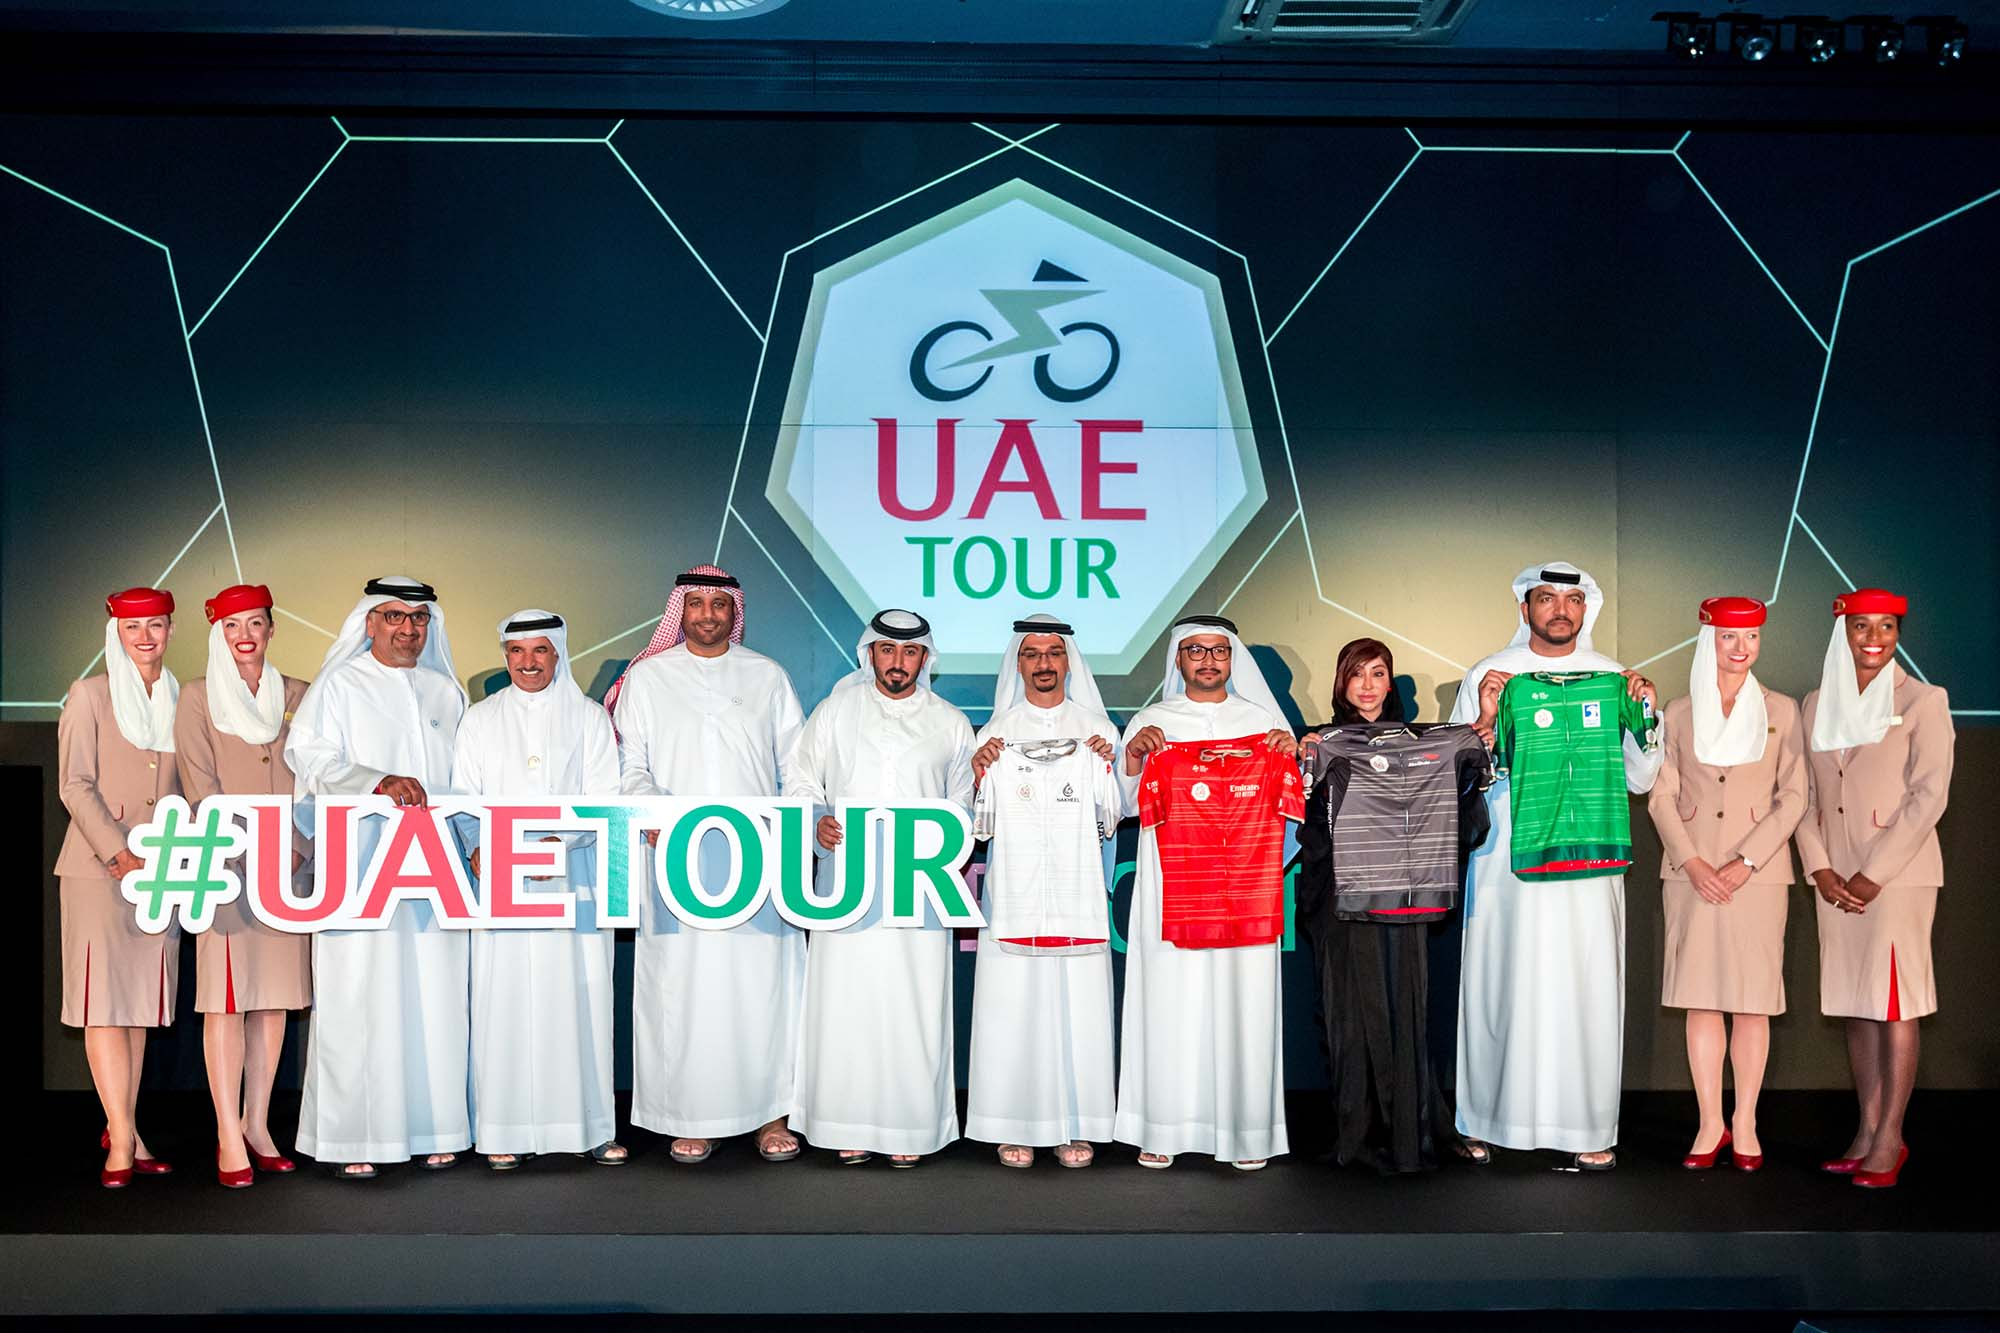 Febrero da pistoletazo de salida a las carreras world tour con el Tour a los Emiratos Árabes Unidos, UAE Tour.